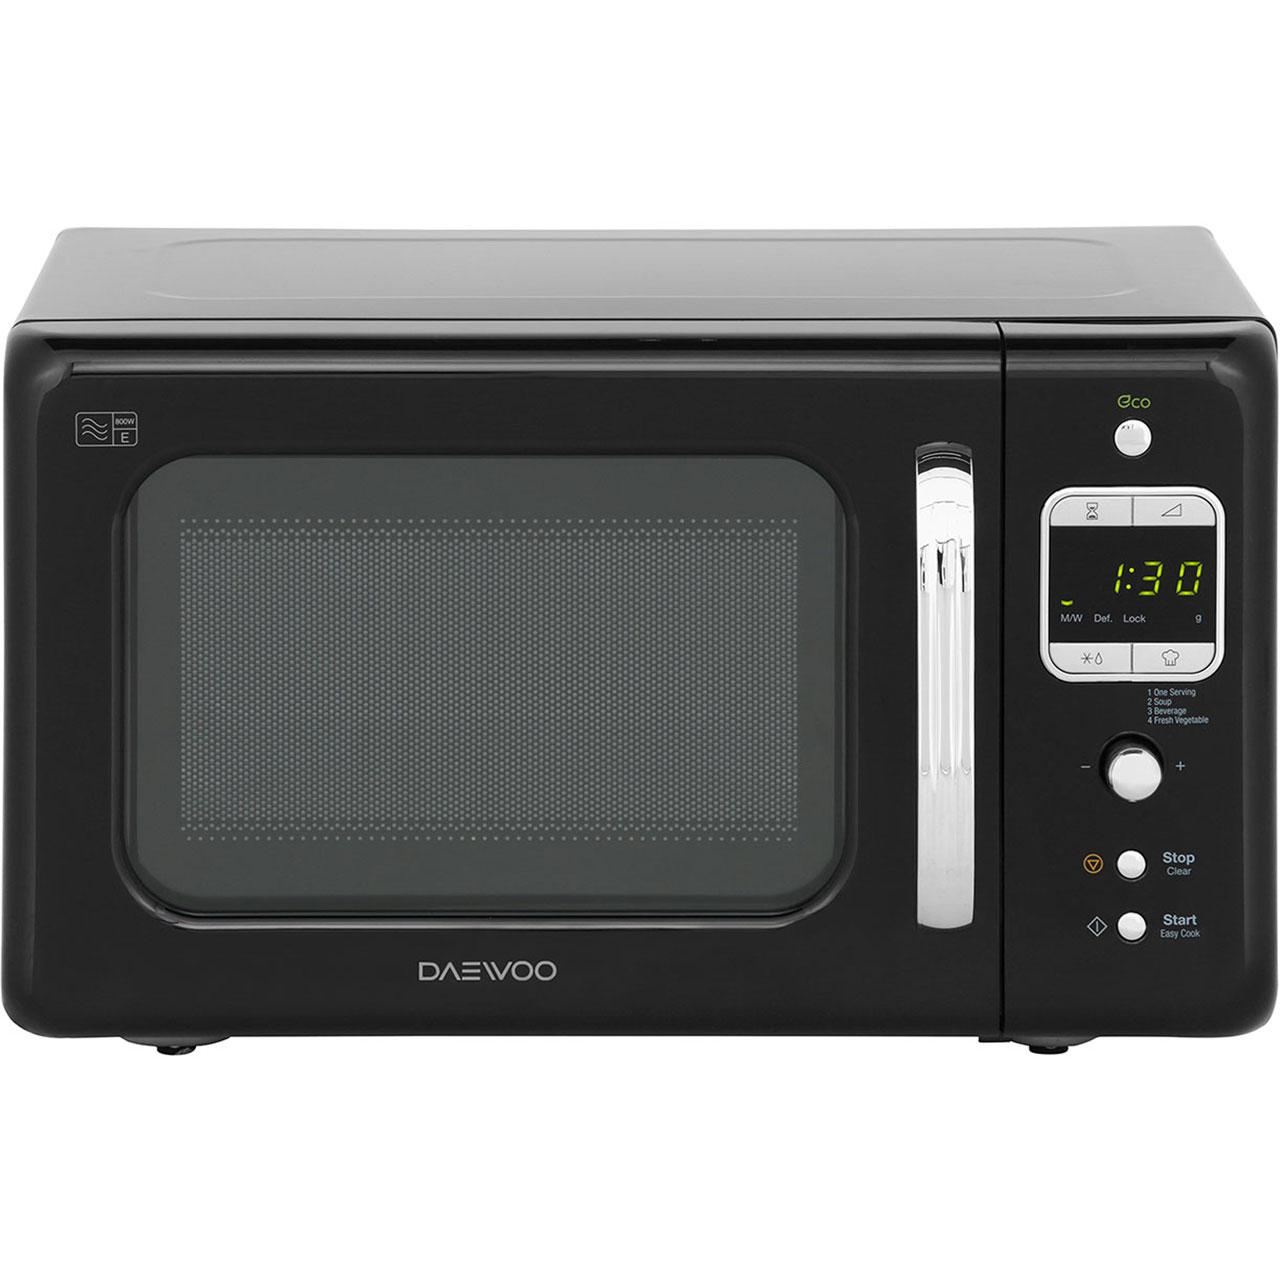 retro style microwave bestmicrowave. Black Bedroom Furniture Sets. Home Design Ideas